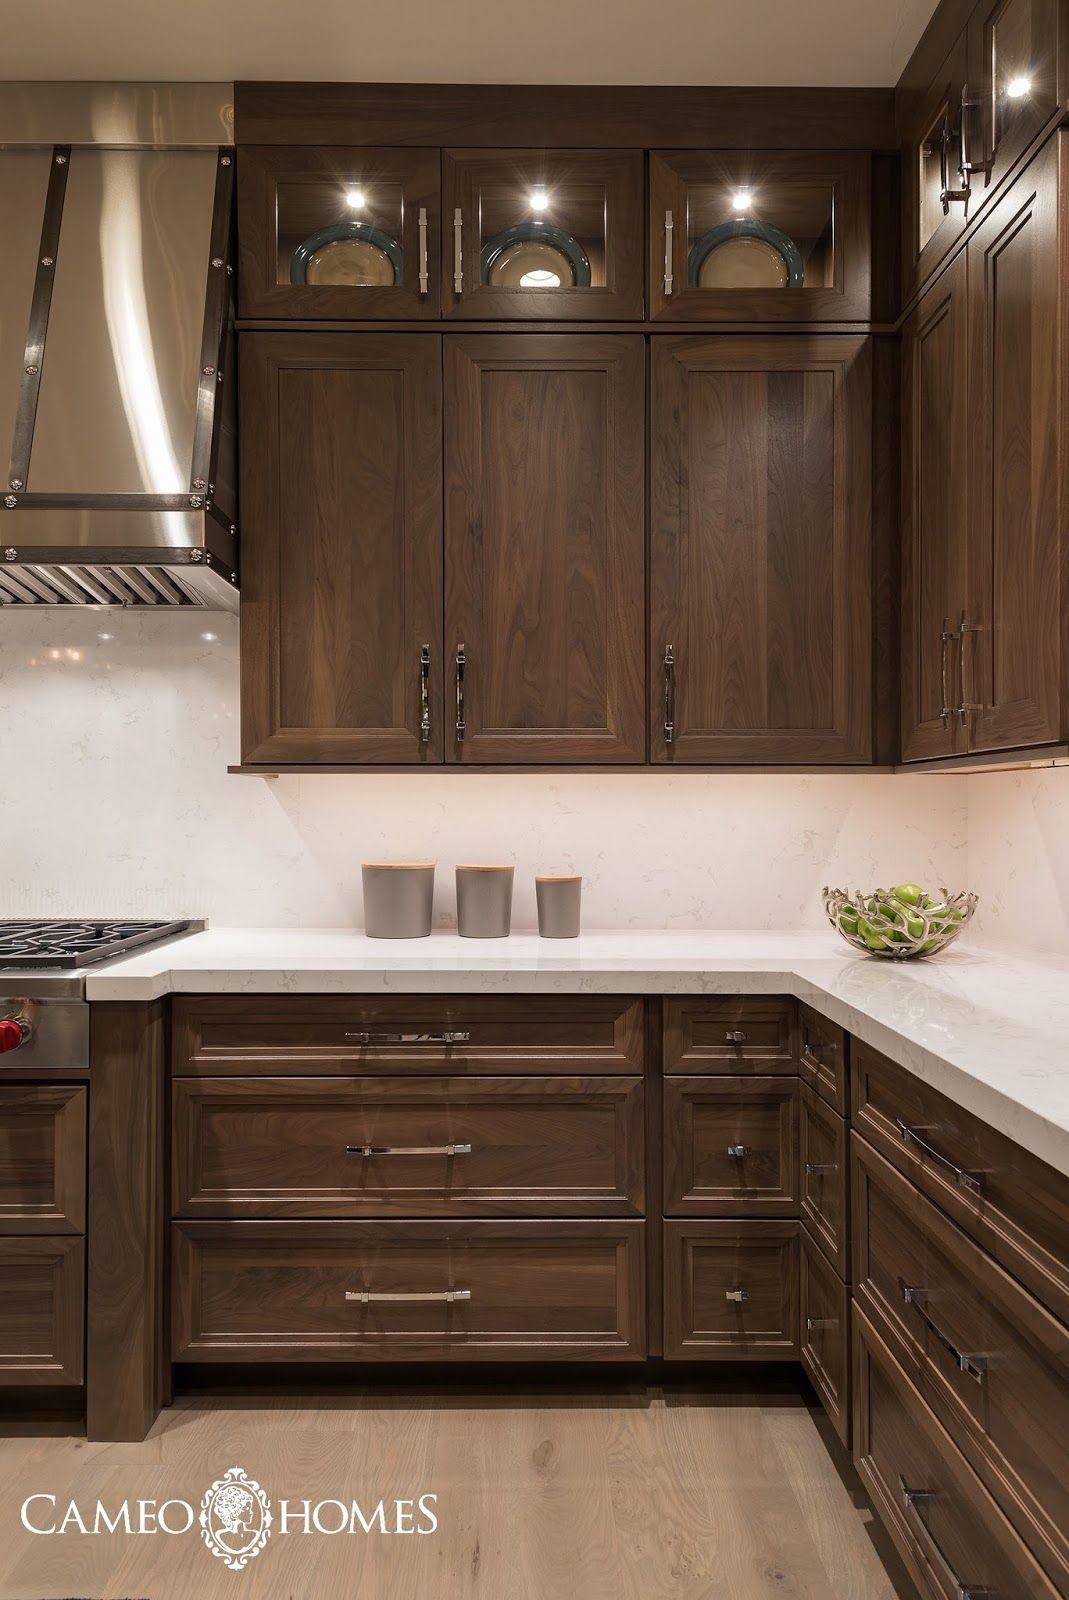 Walnut Cabinets White Quartz Counters Farmhouse Style Kitchen Cabinets Kitchen Cabinet Styles Brown Kitchen Cabinets